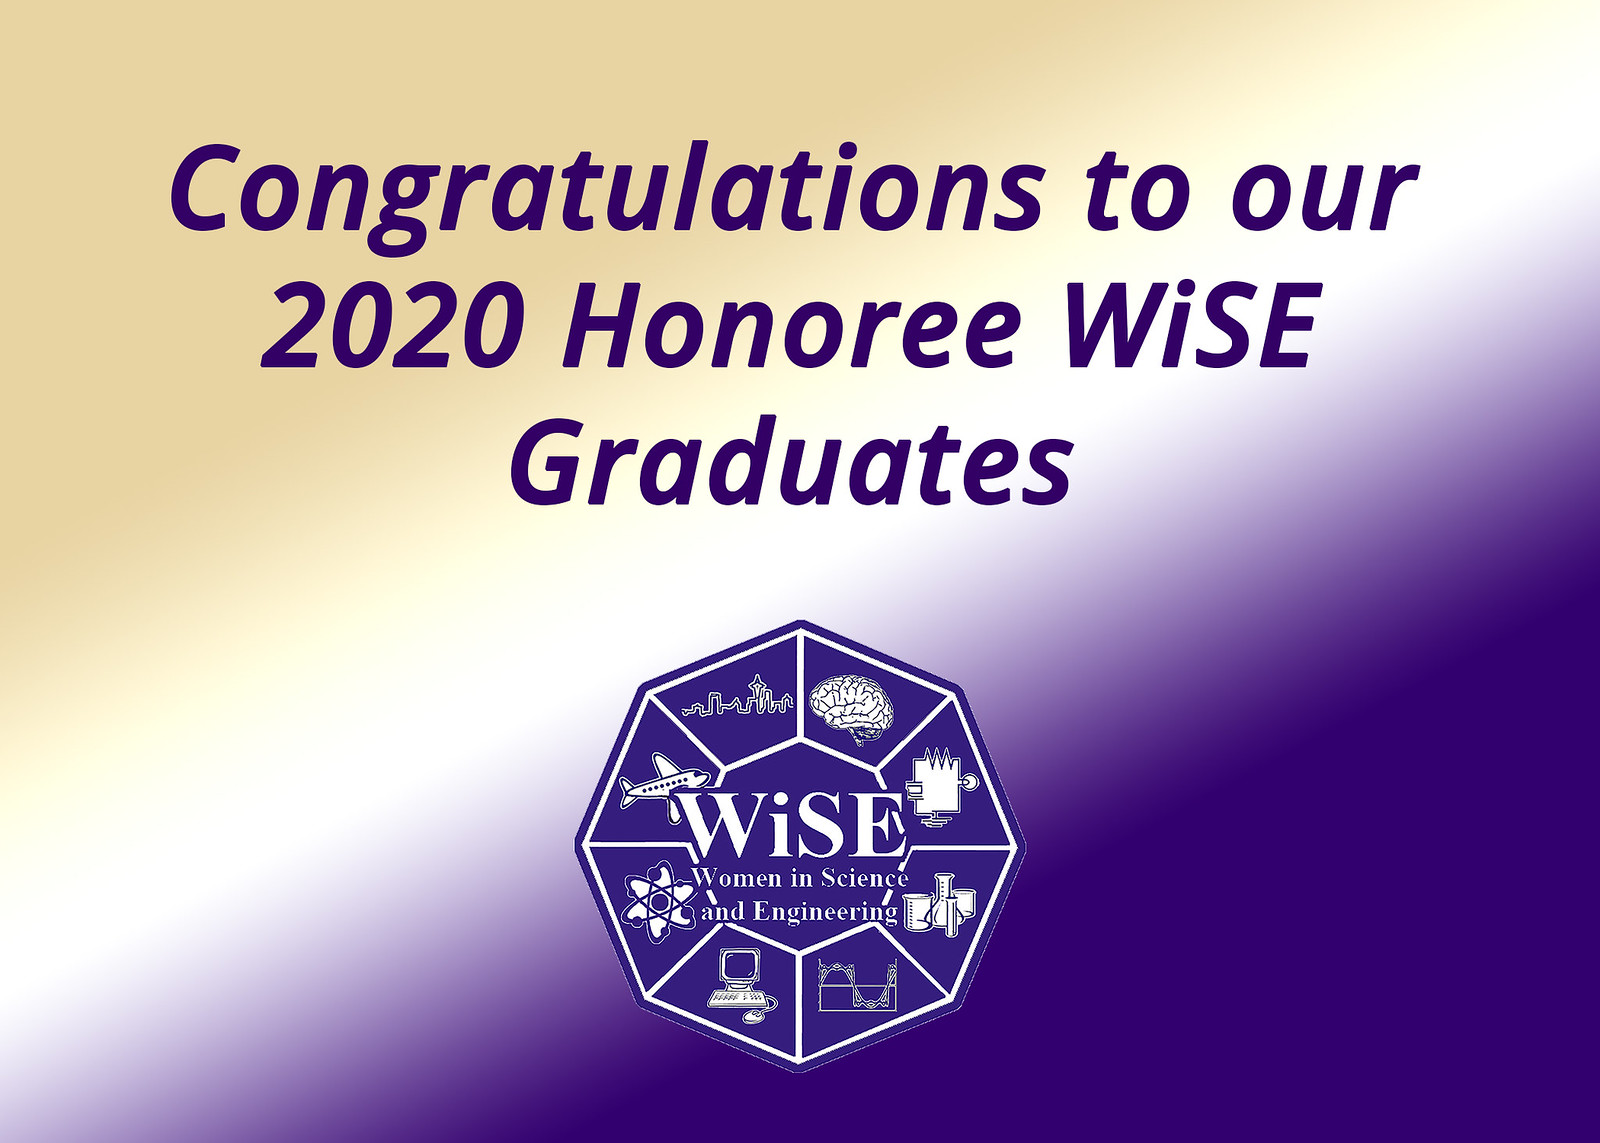 2020 Honoree WiSE Graduates